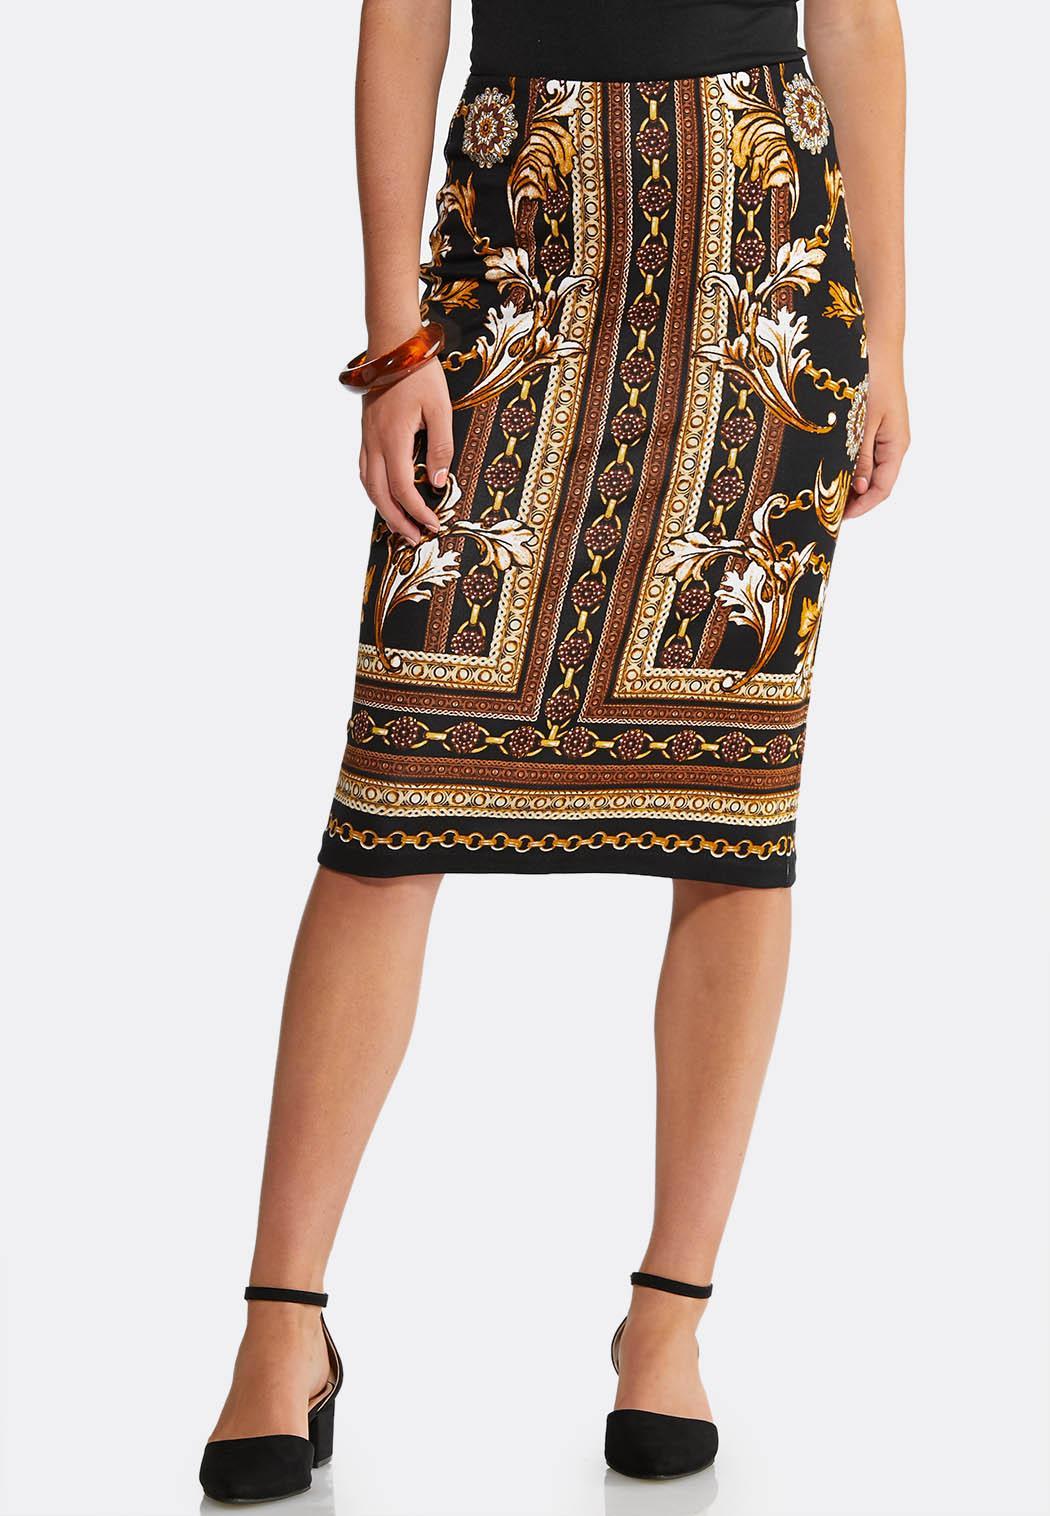 Plus Size Status Pencil Skirt Skirts Cato Fashions